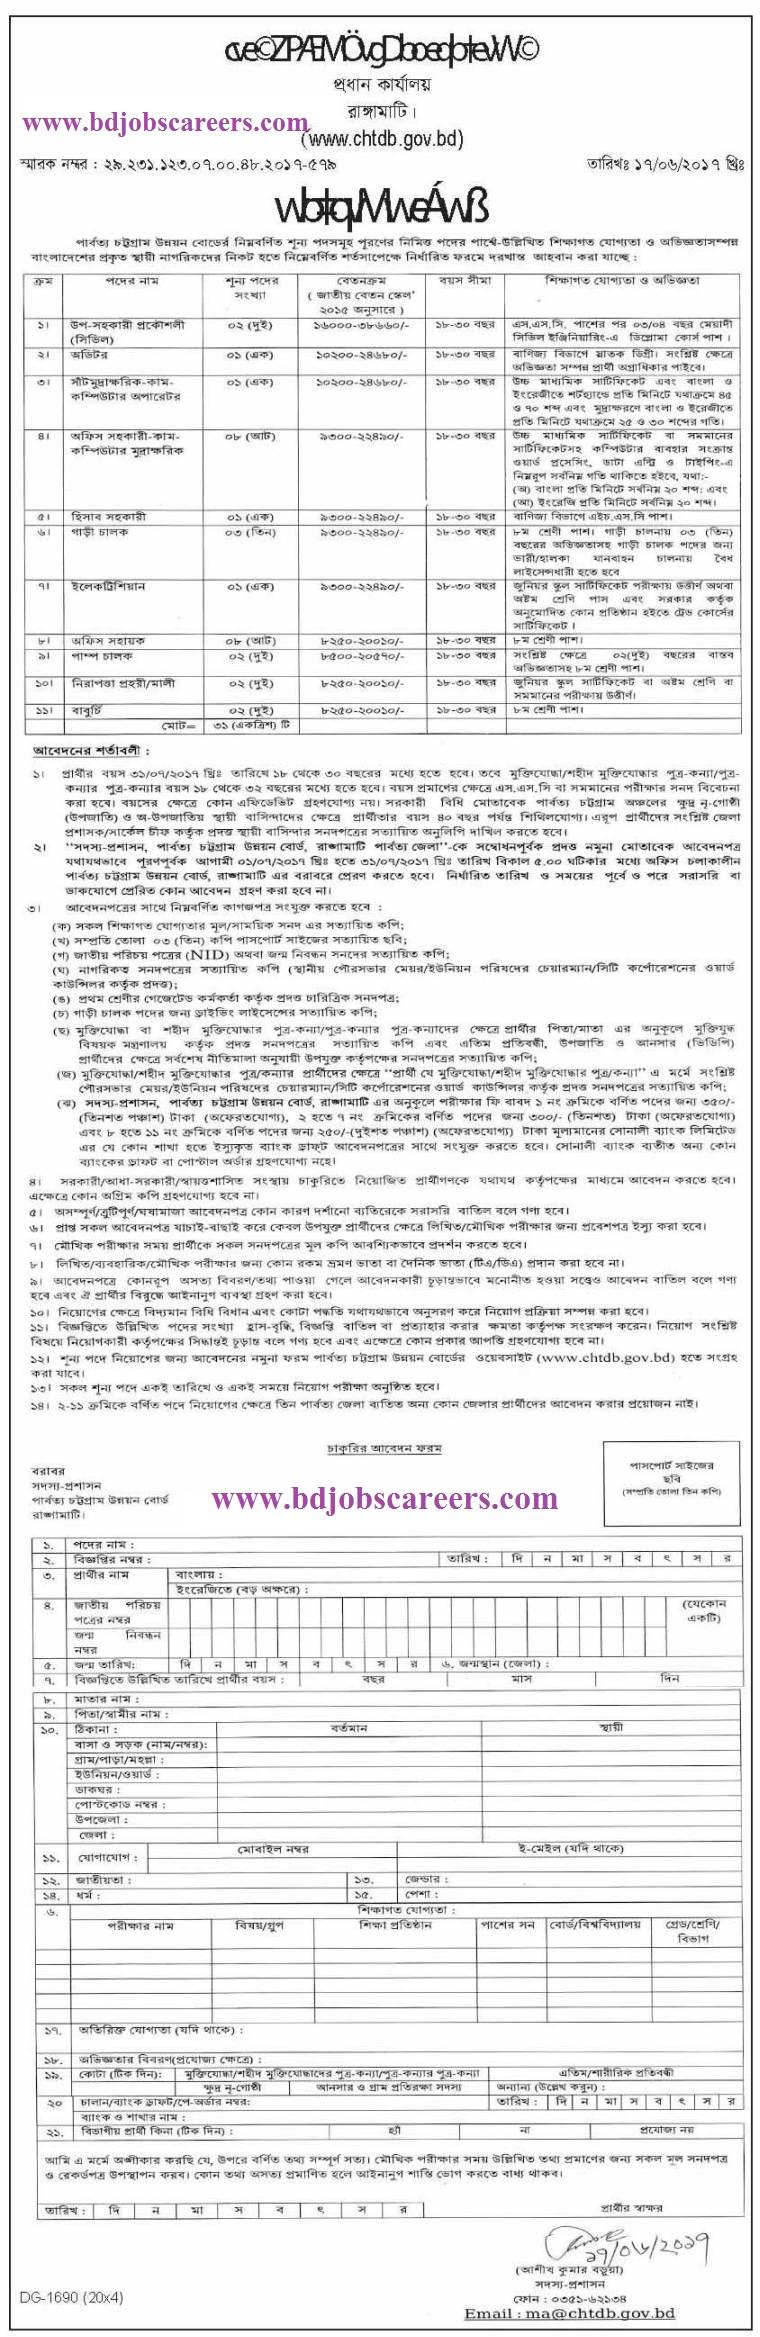 Chittagong Hill Tracts Development Board Job Circular 2017